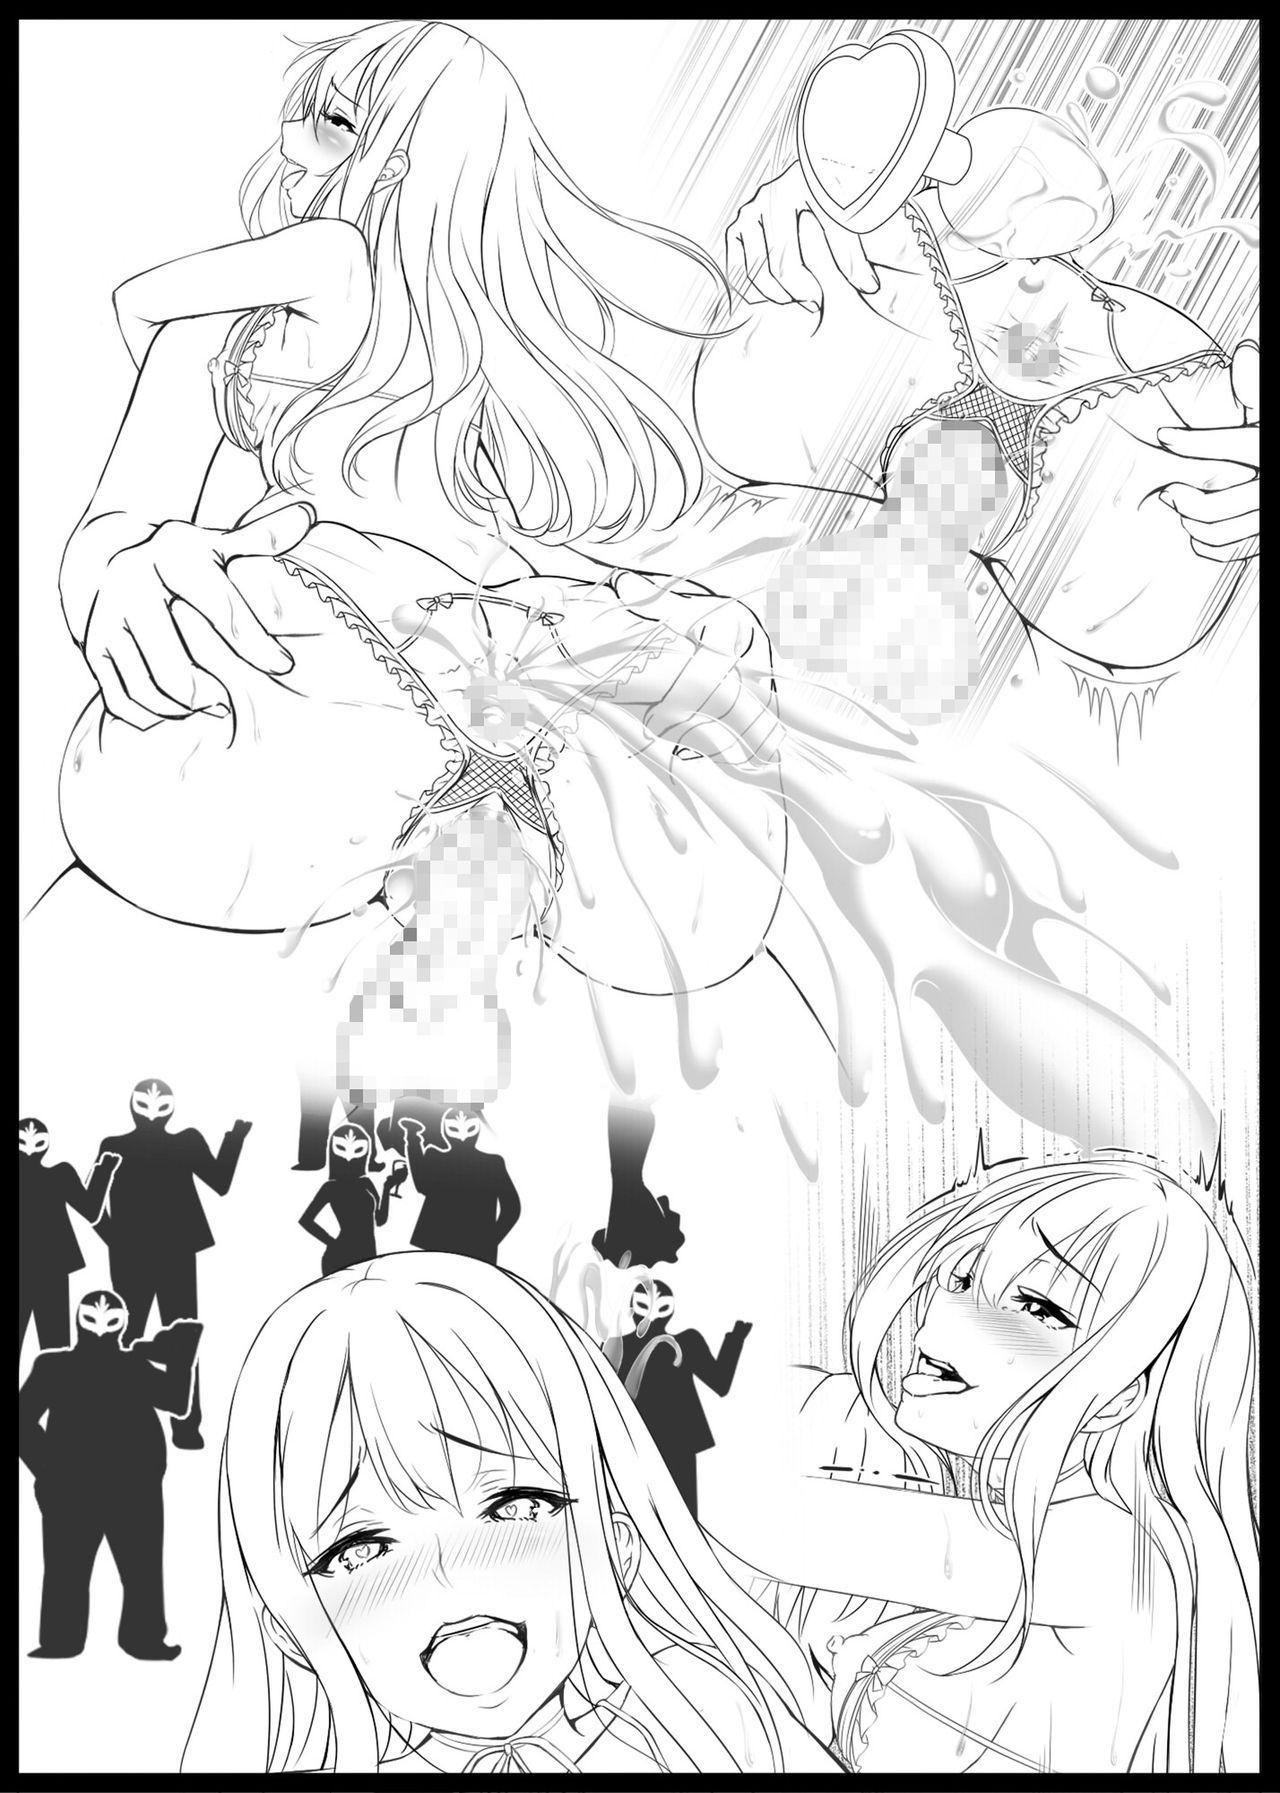 [Mitarashidou (Ikemura Hiroichi)] P no Idol Kyouiku Shidou 3 - ShibuRin Hen (Chuukyuu Stretch)   P的偶像教育指导3 - 涩谷凛篇(中级难度体操篇) (THE IDOLM@STER CINDERELLA GIRLS) [Chinese] [靴下汉化组] [Digital] 30